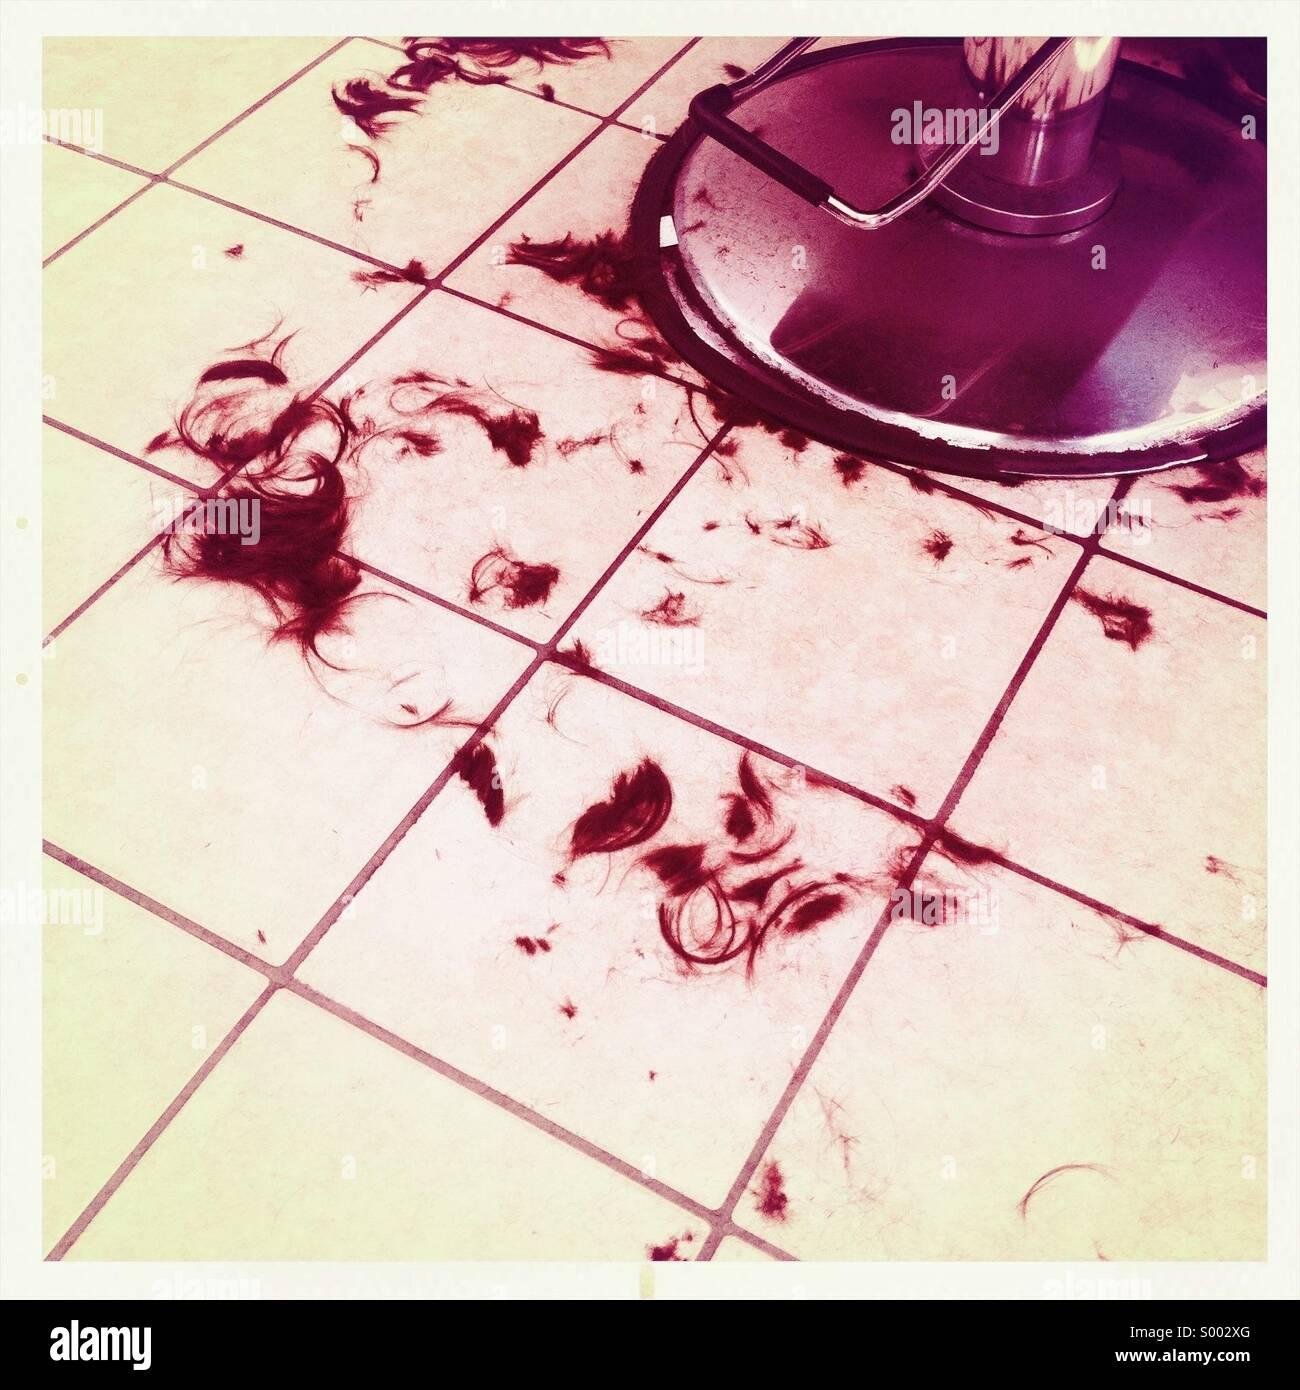 The floor beneath a haircut chair Stock Photo